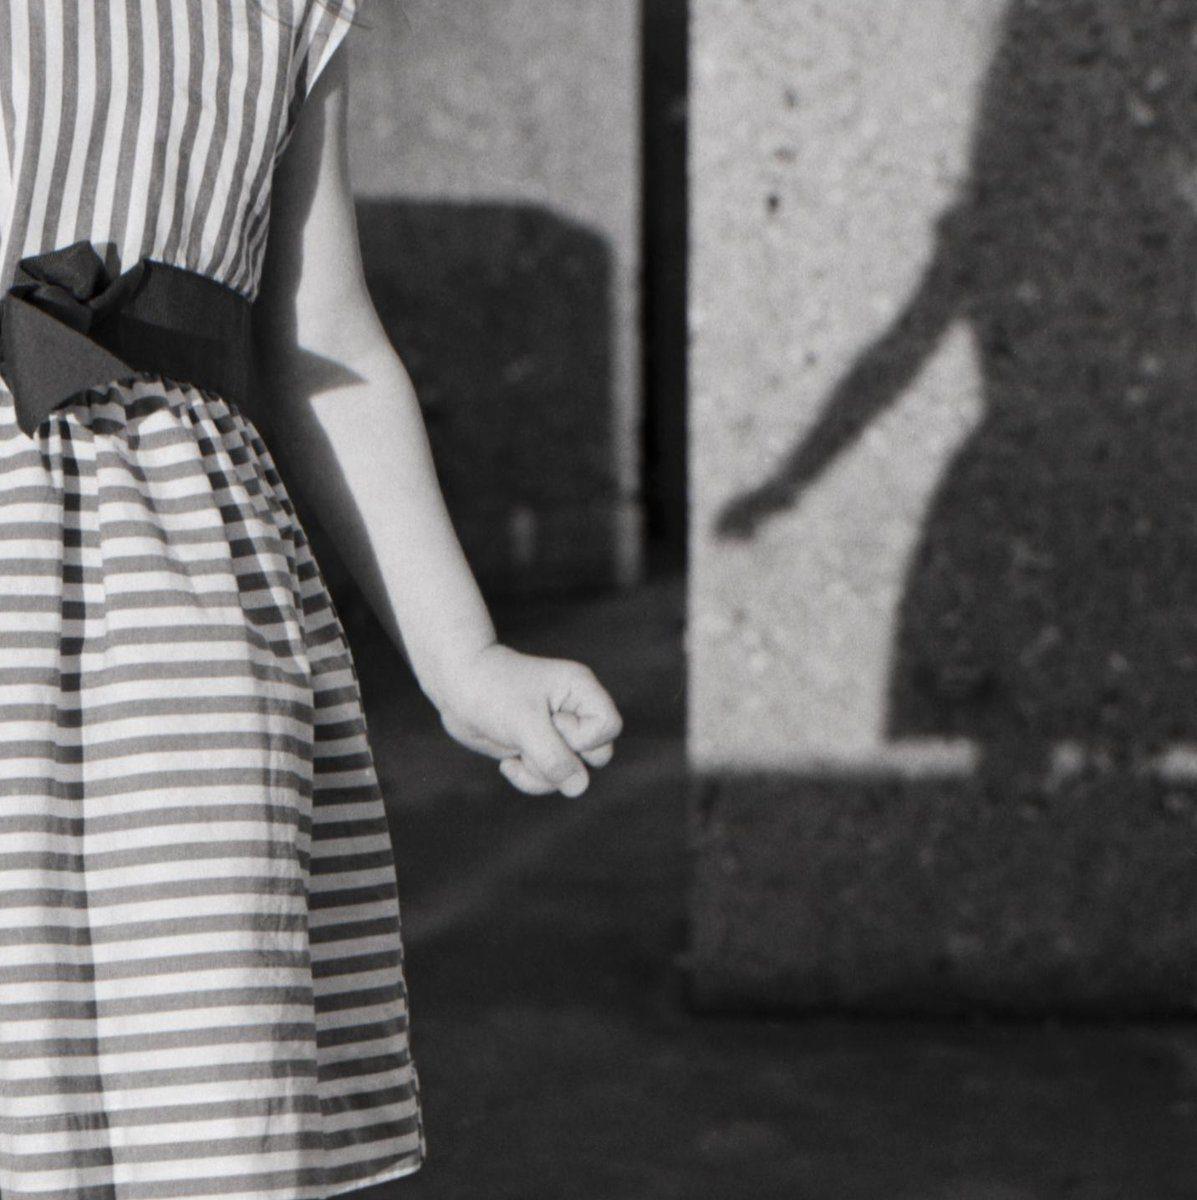 @TheFeelofFilm 23h23 hours ago Hootlet More On @ILFORDPhoto HP5+ for #ilfordphoto #fridayfavourites #IWD2019